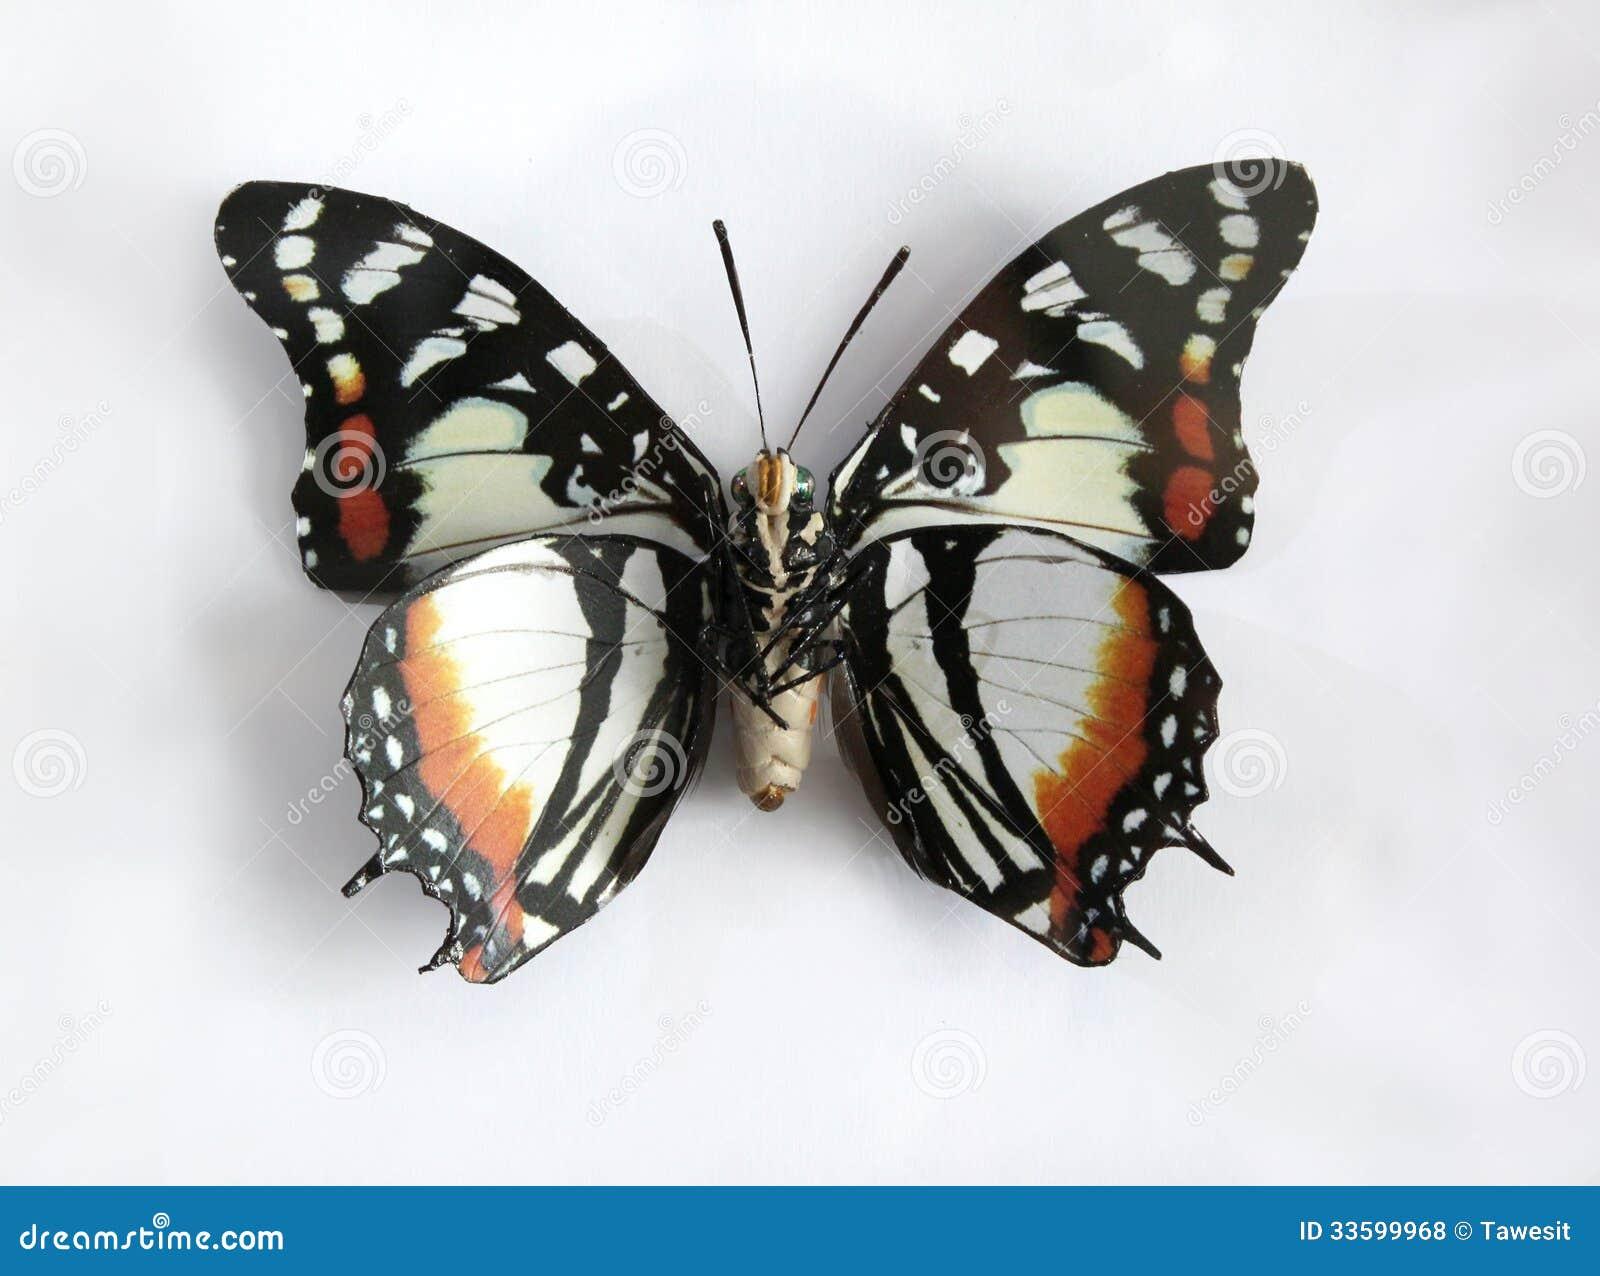 Charaxes Superbus uma borboleta gigante bonita